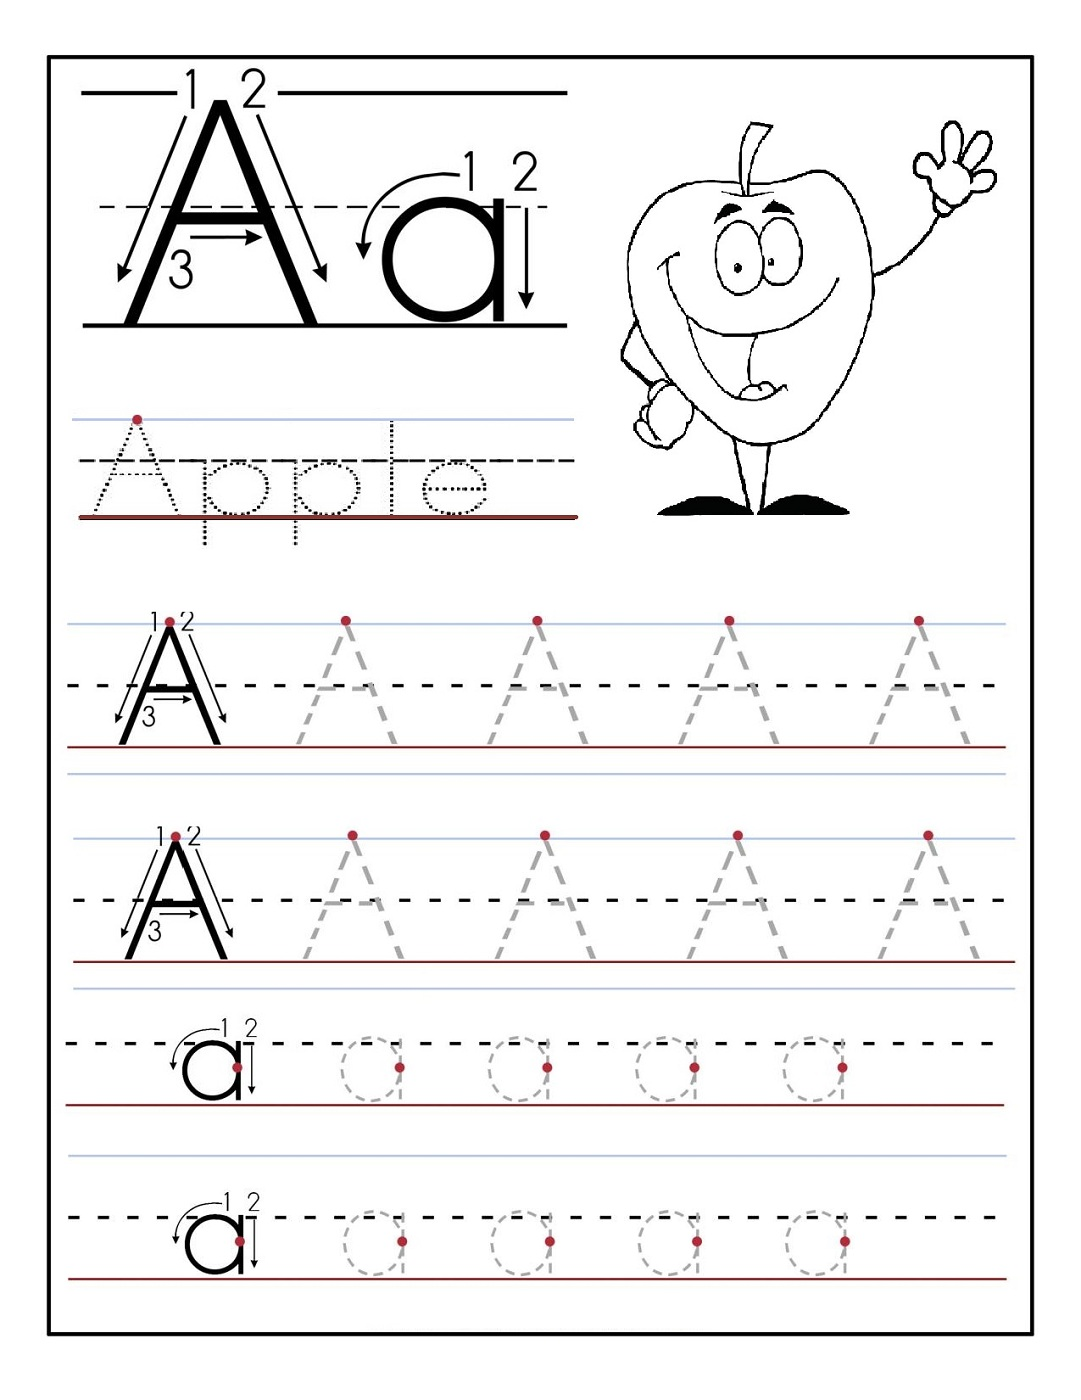 Printable Letter Tracing Worksheets